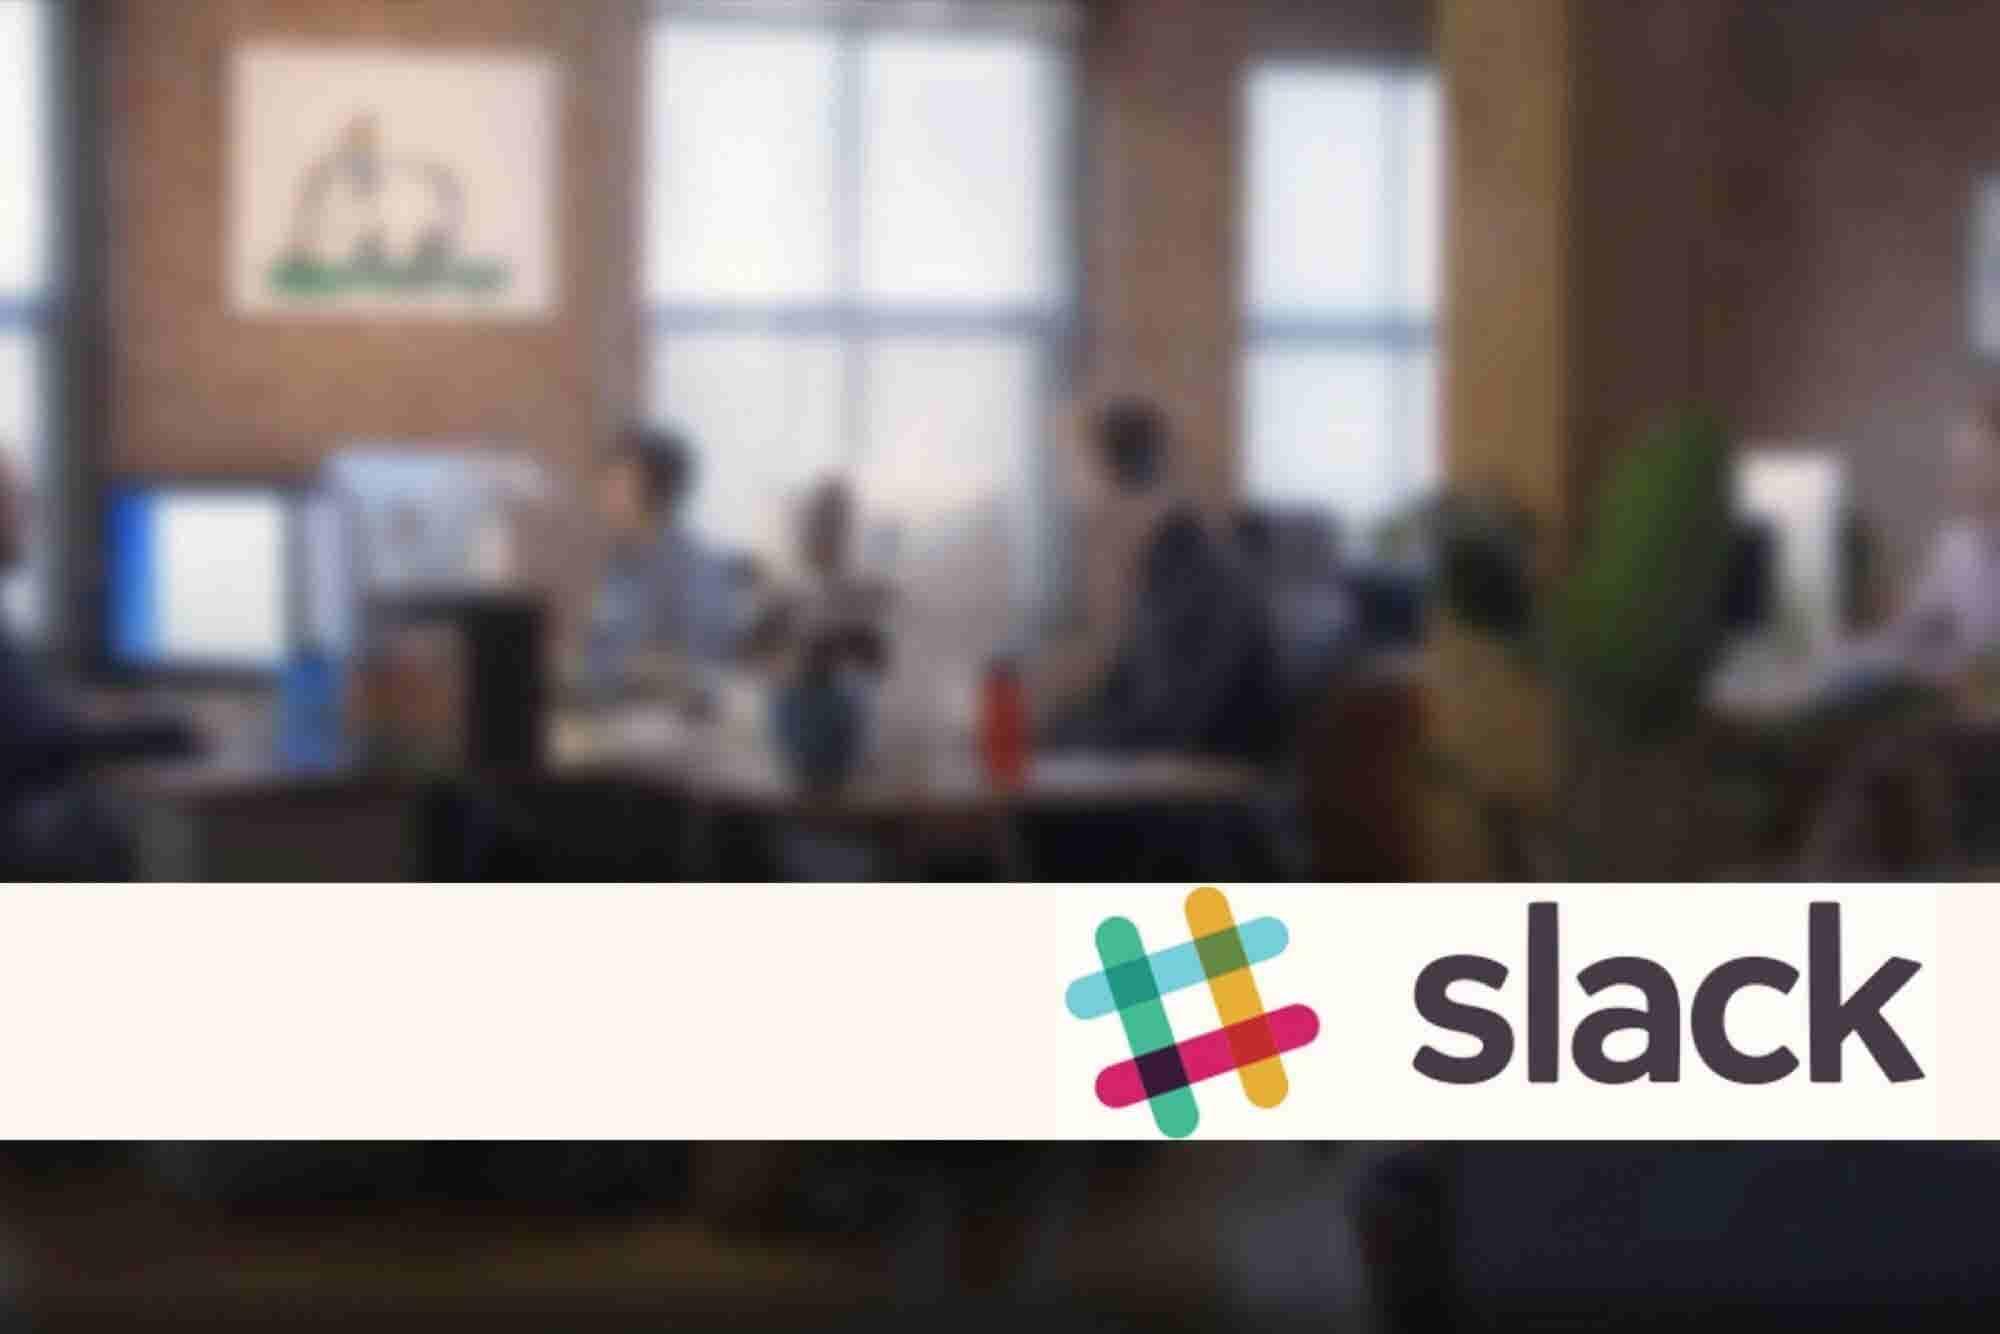 Slack Valuation More Than Doubles to $2.8 Billion